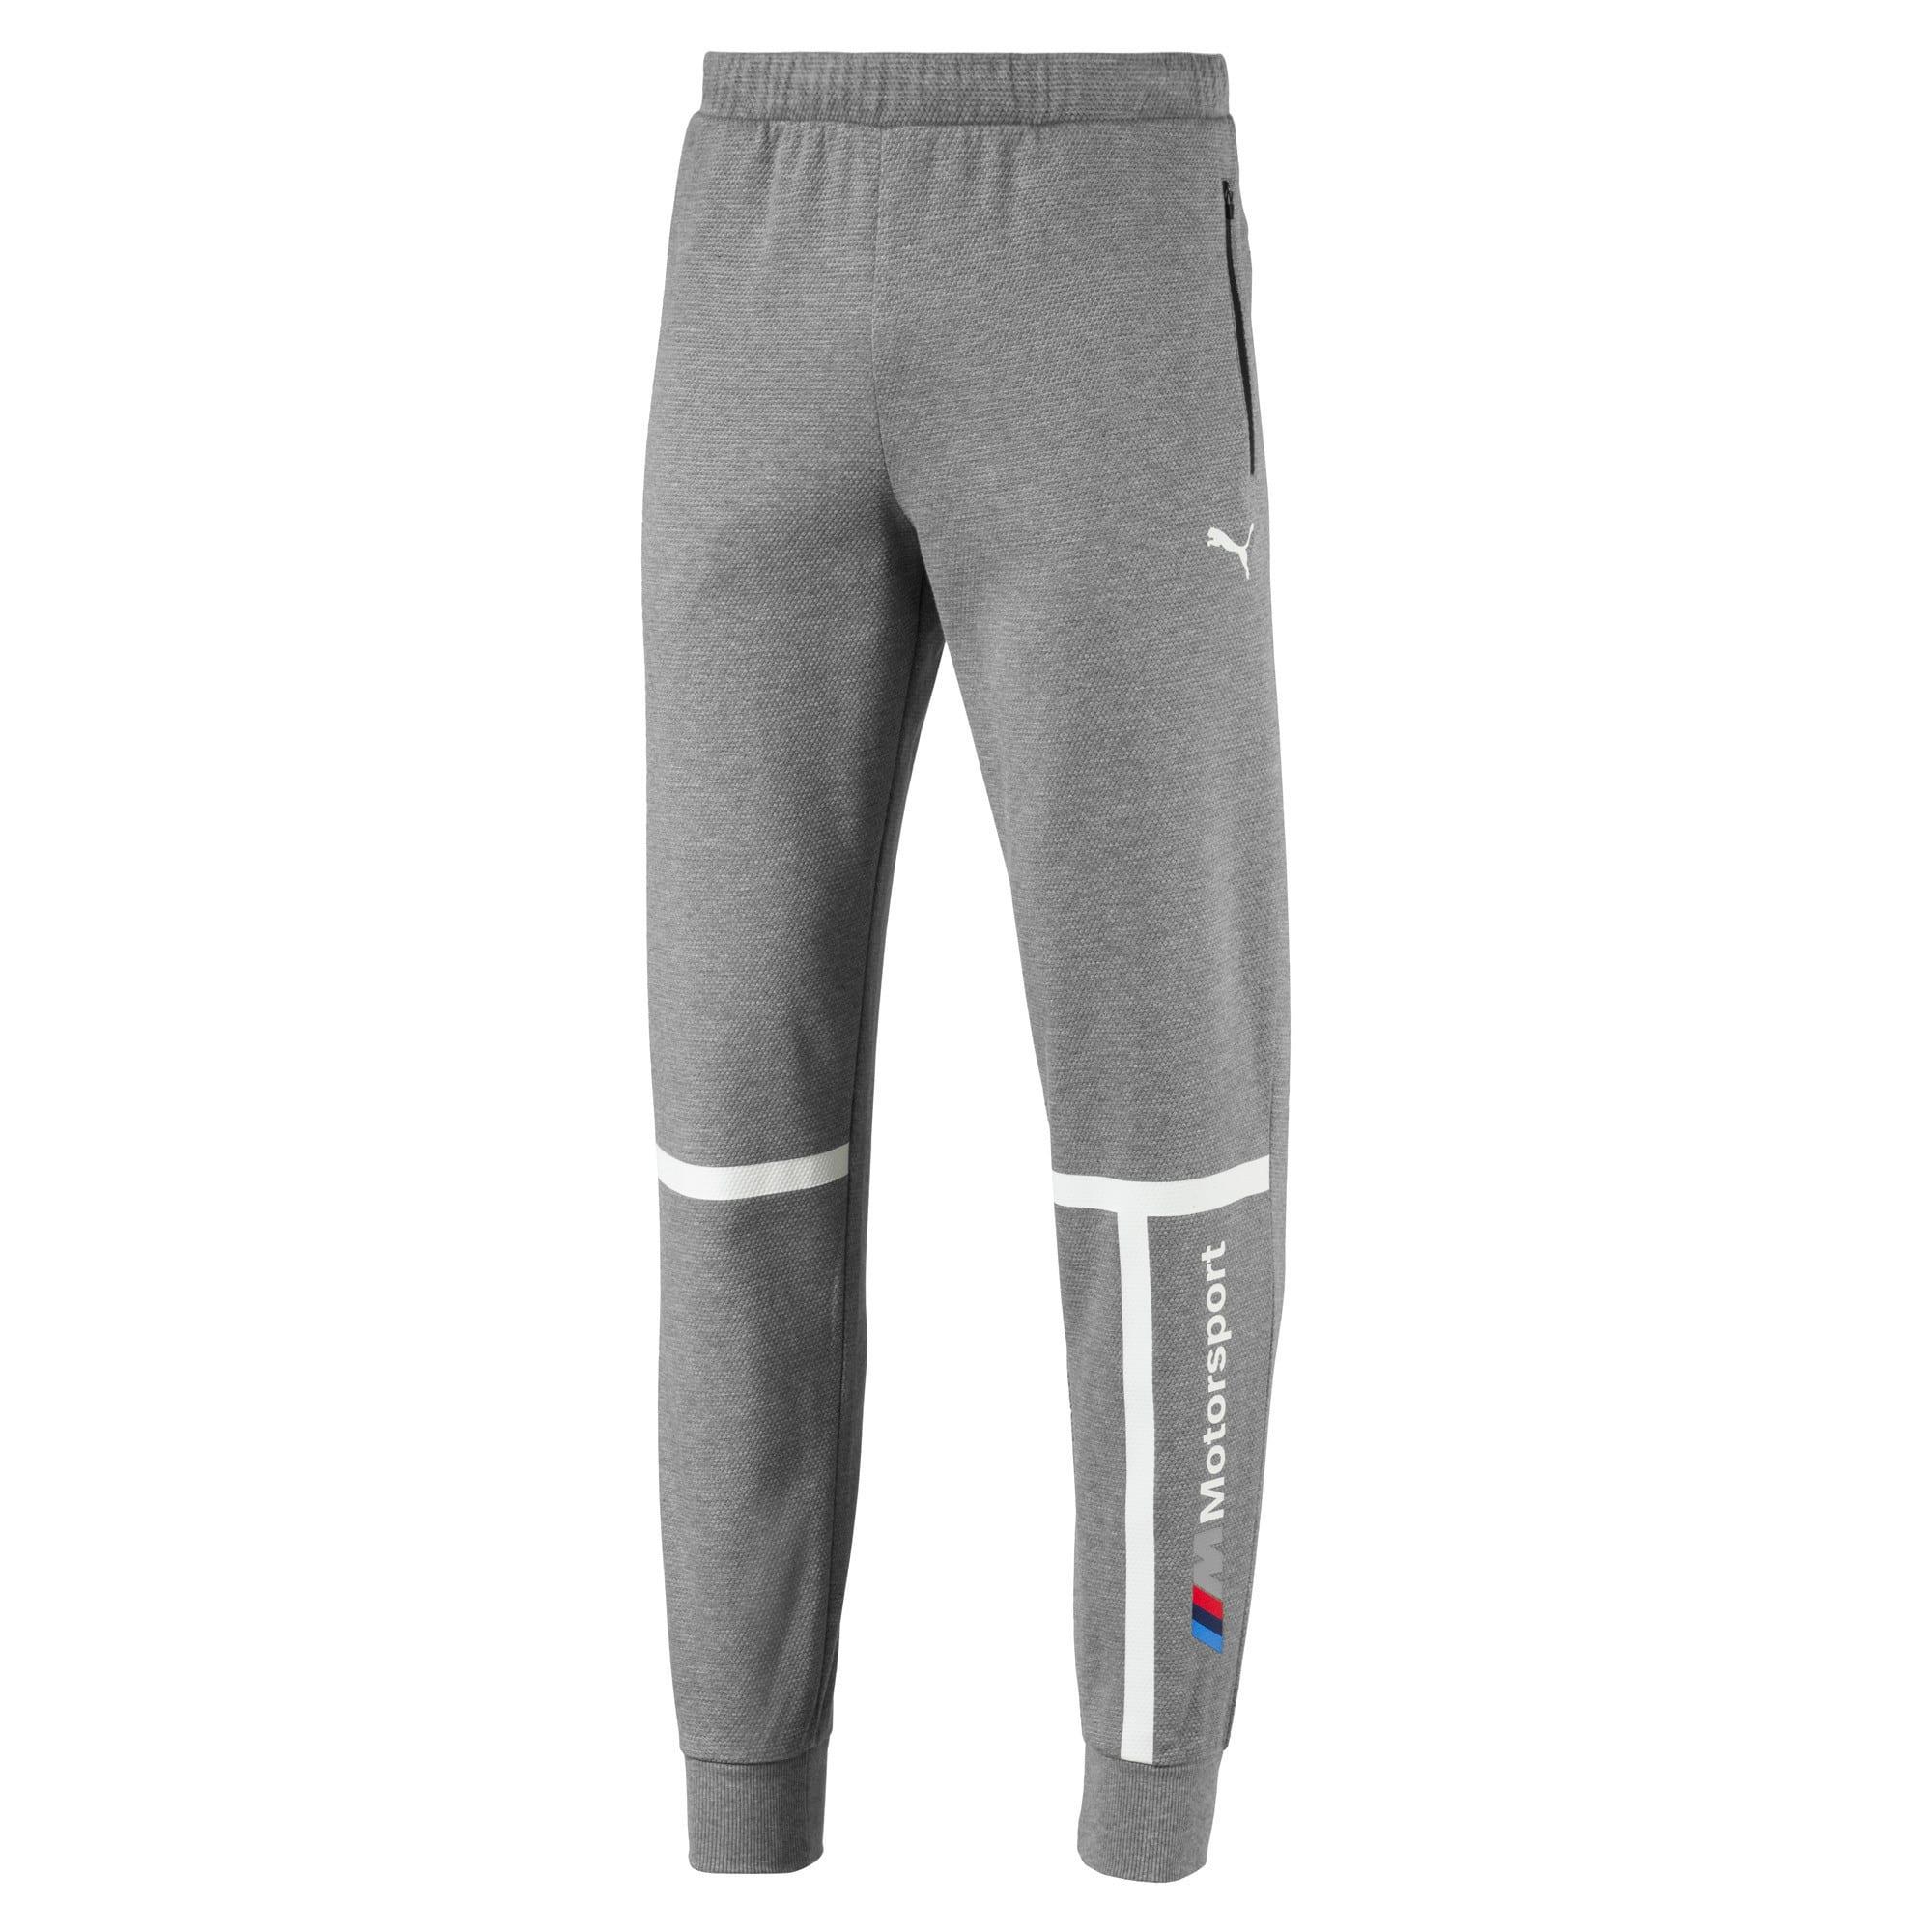 Thumbnail 4 of BMW Motorsport Knitted Men's Sweatpants, Medium Gray Heather, medium-IND